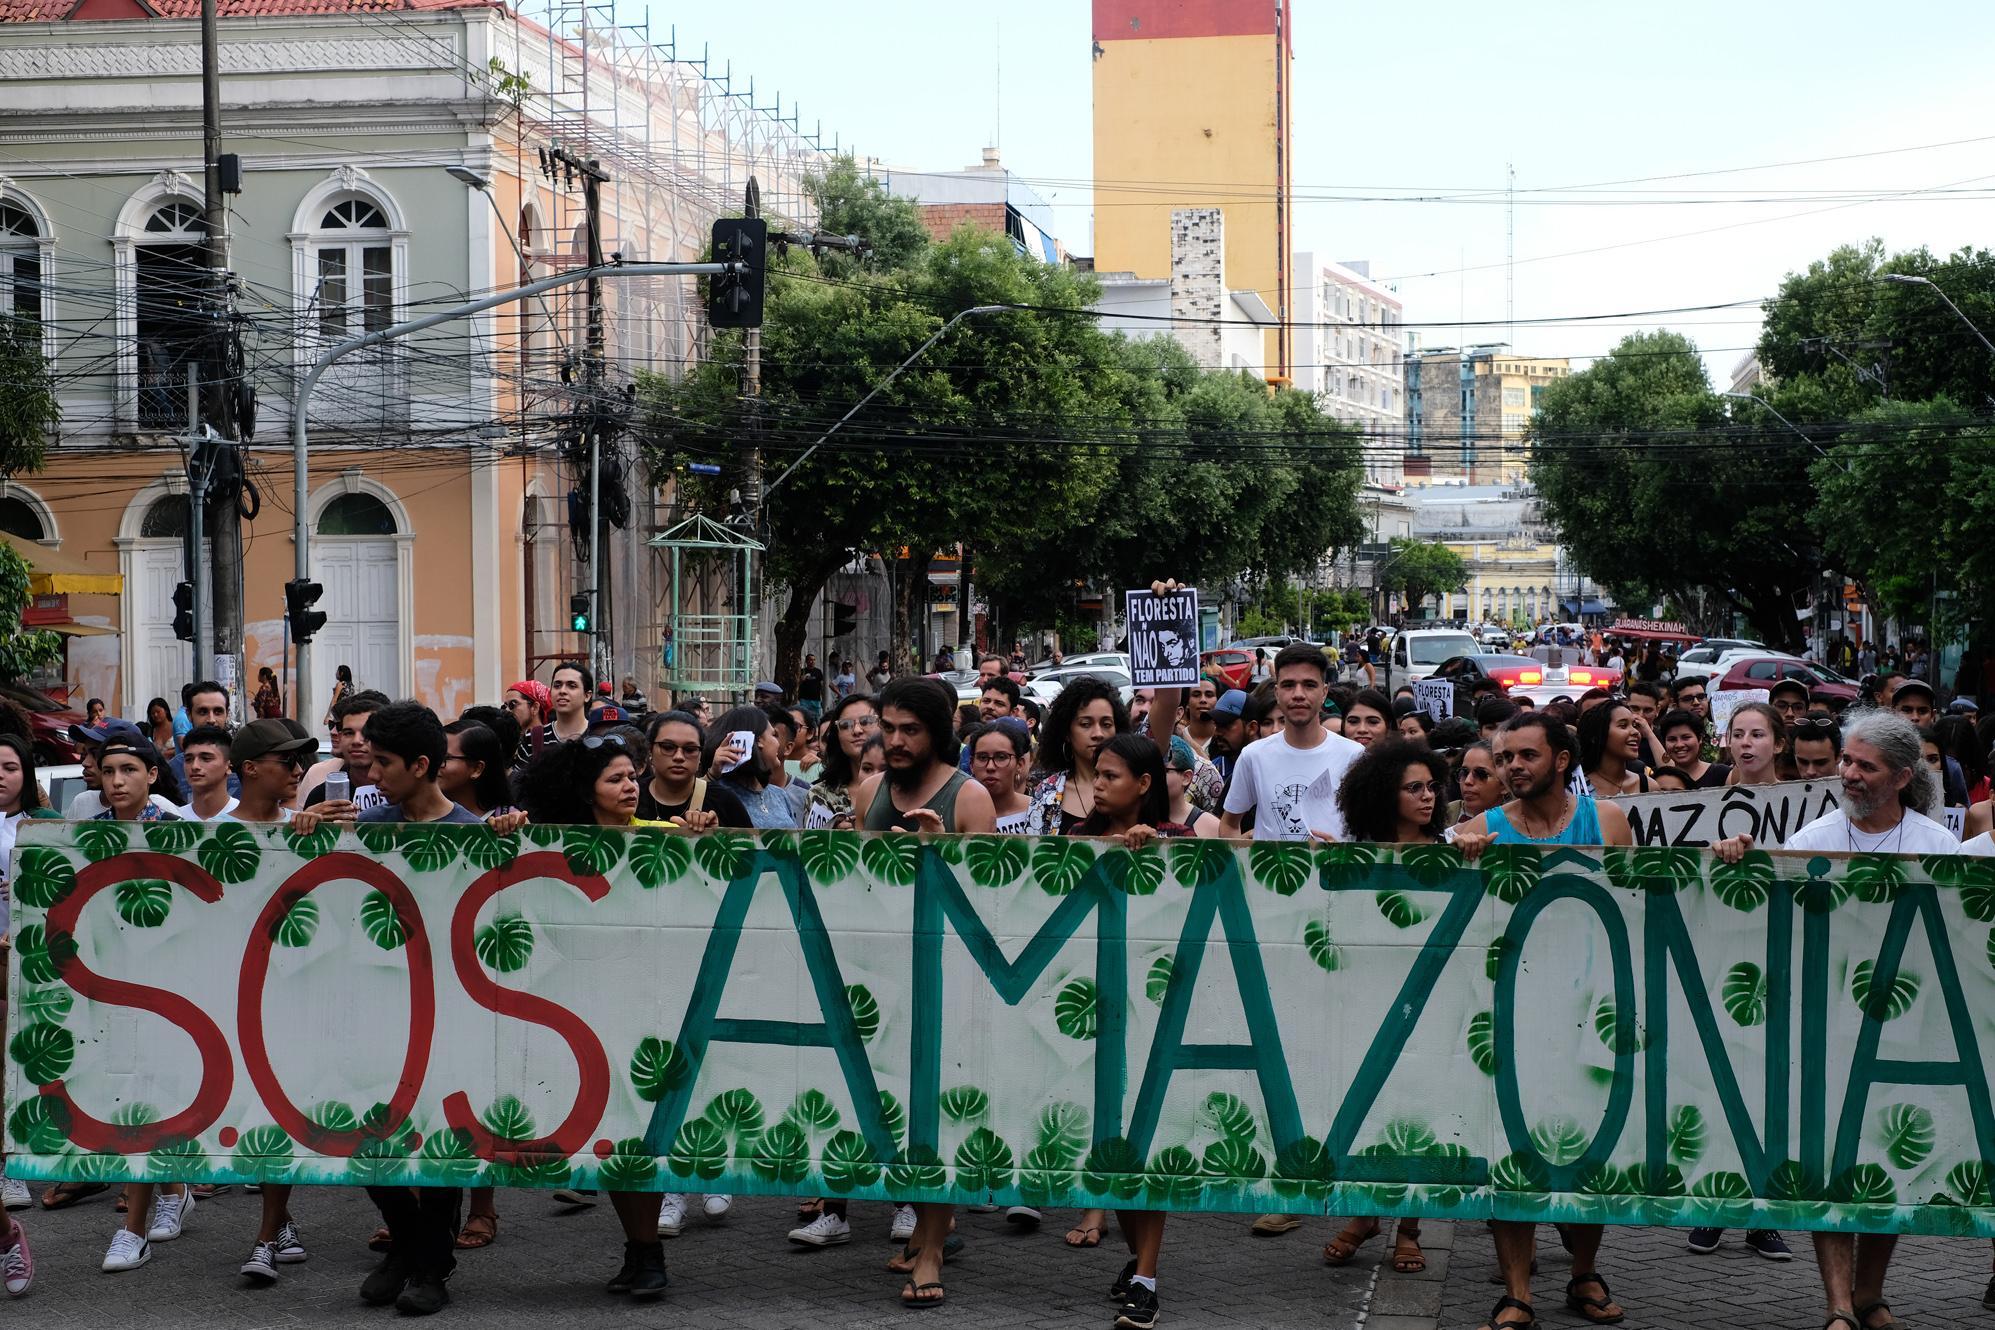 Amazônia em Chamas, Brasil em Transe